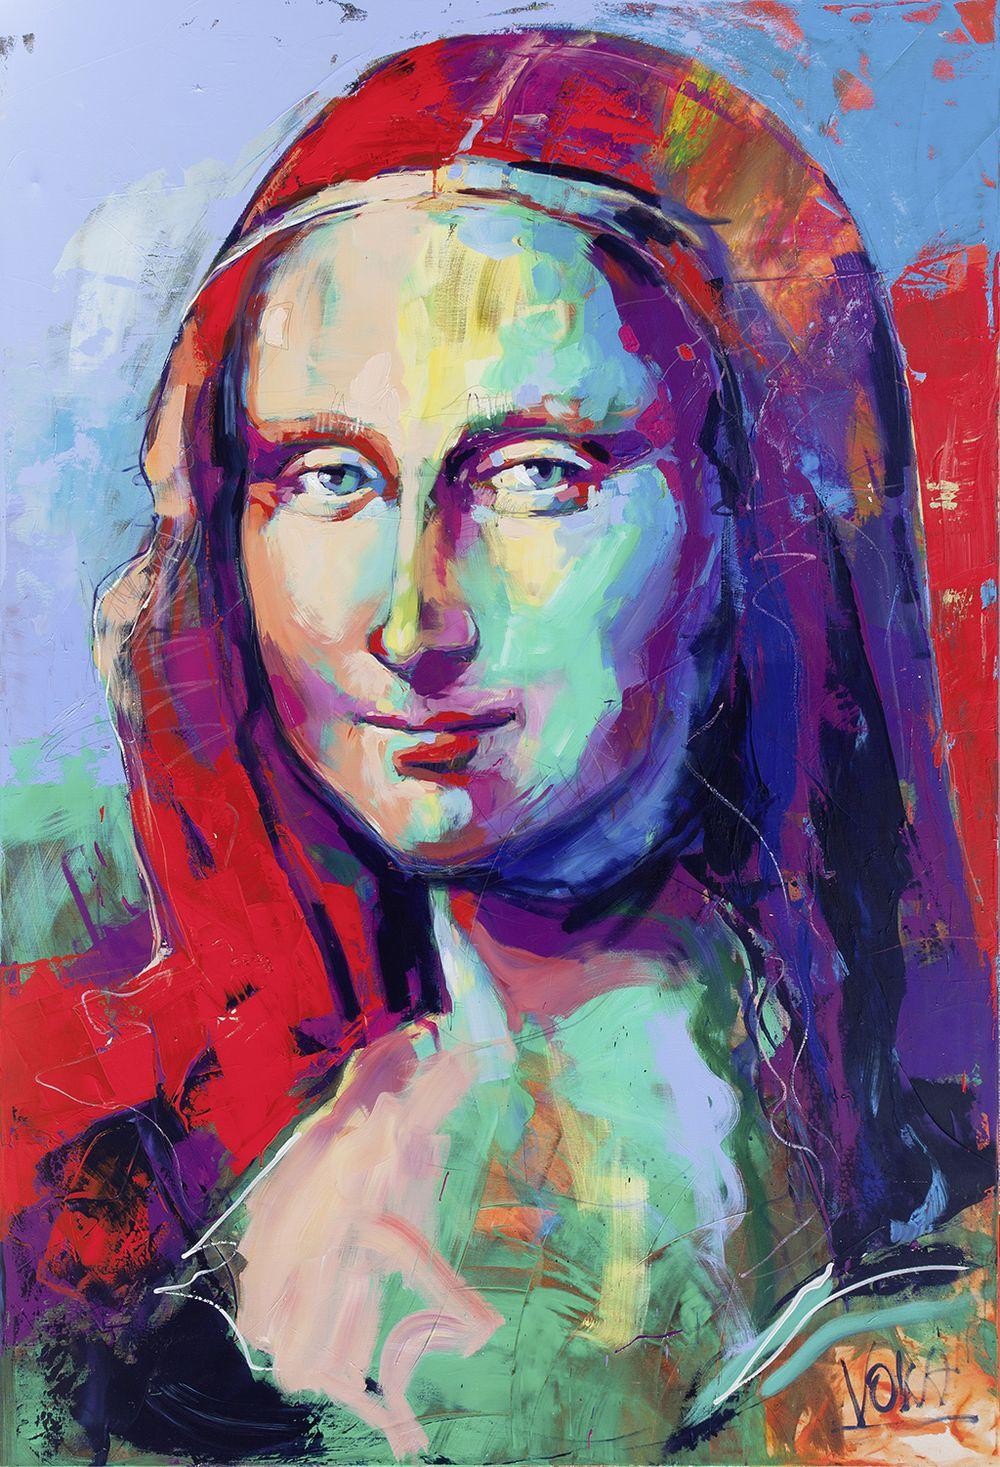 Mona Lisa 280x190 cm 110 24x74 8 inch acrylic on canvas